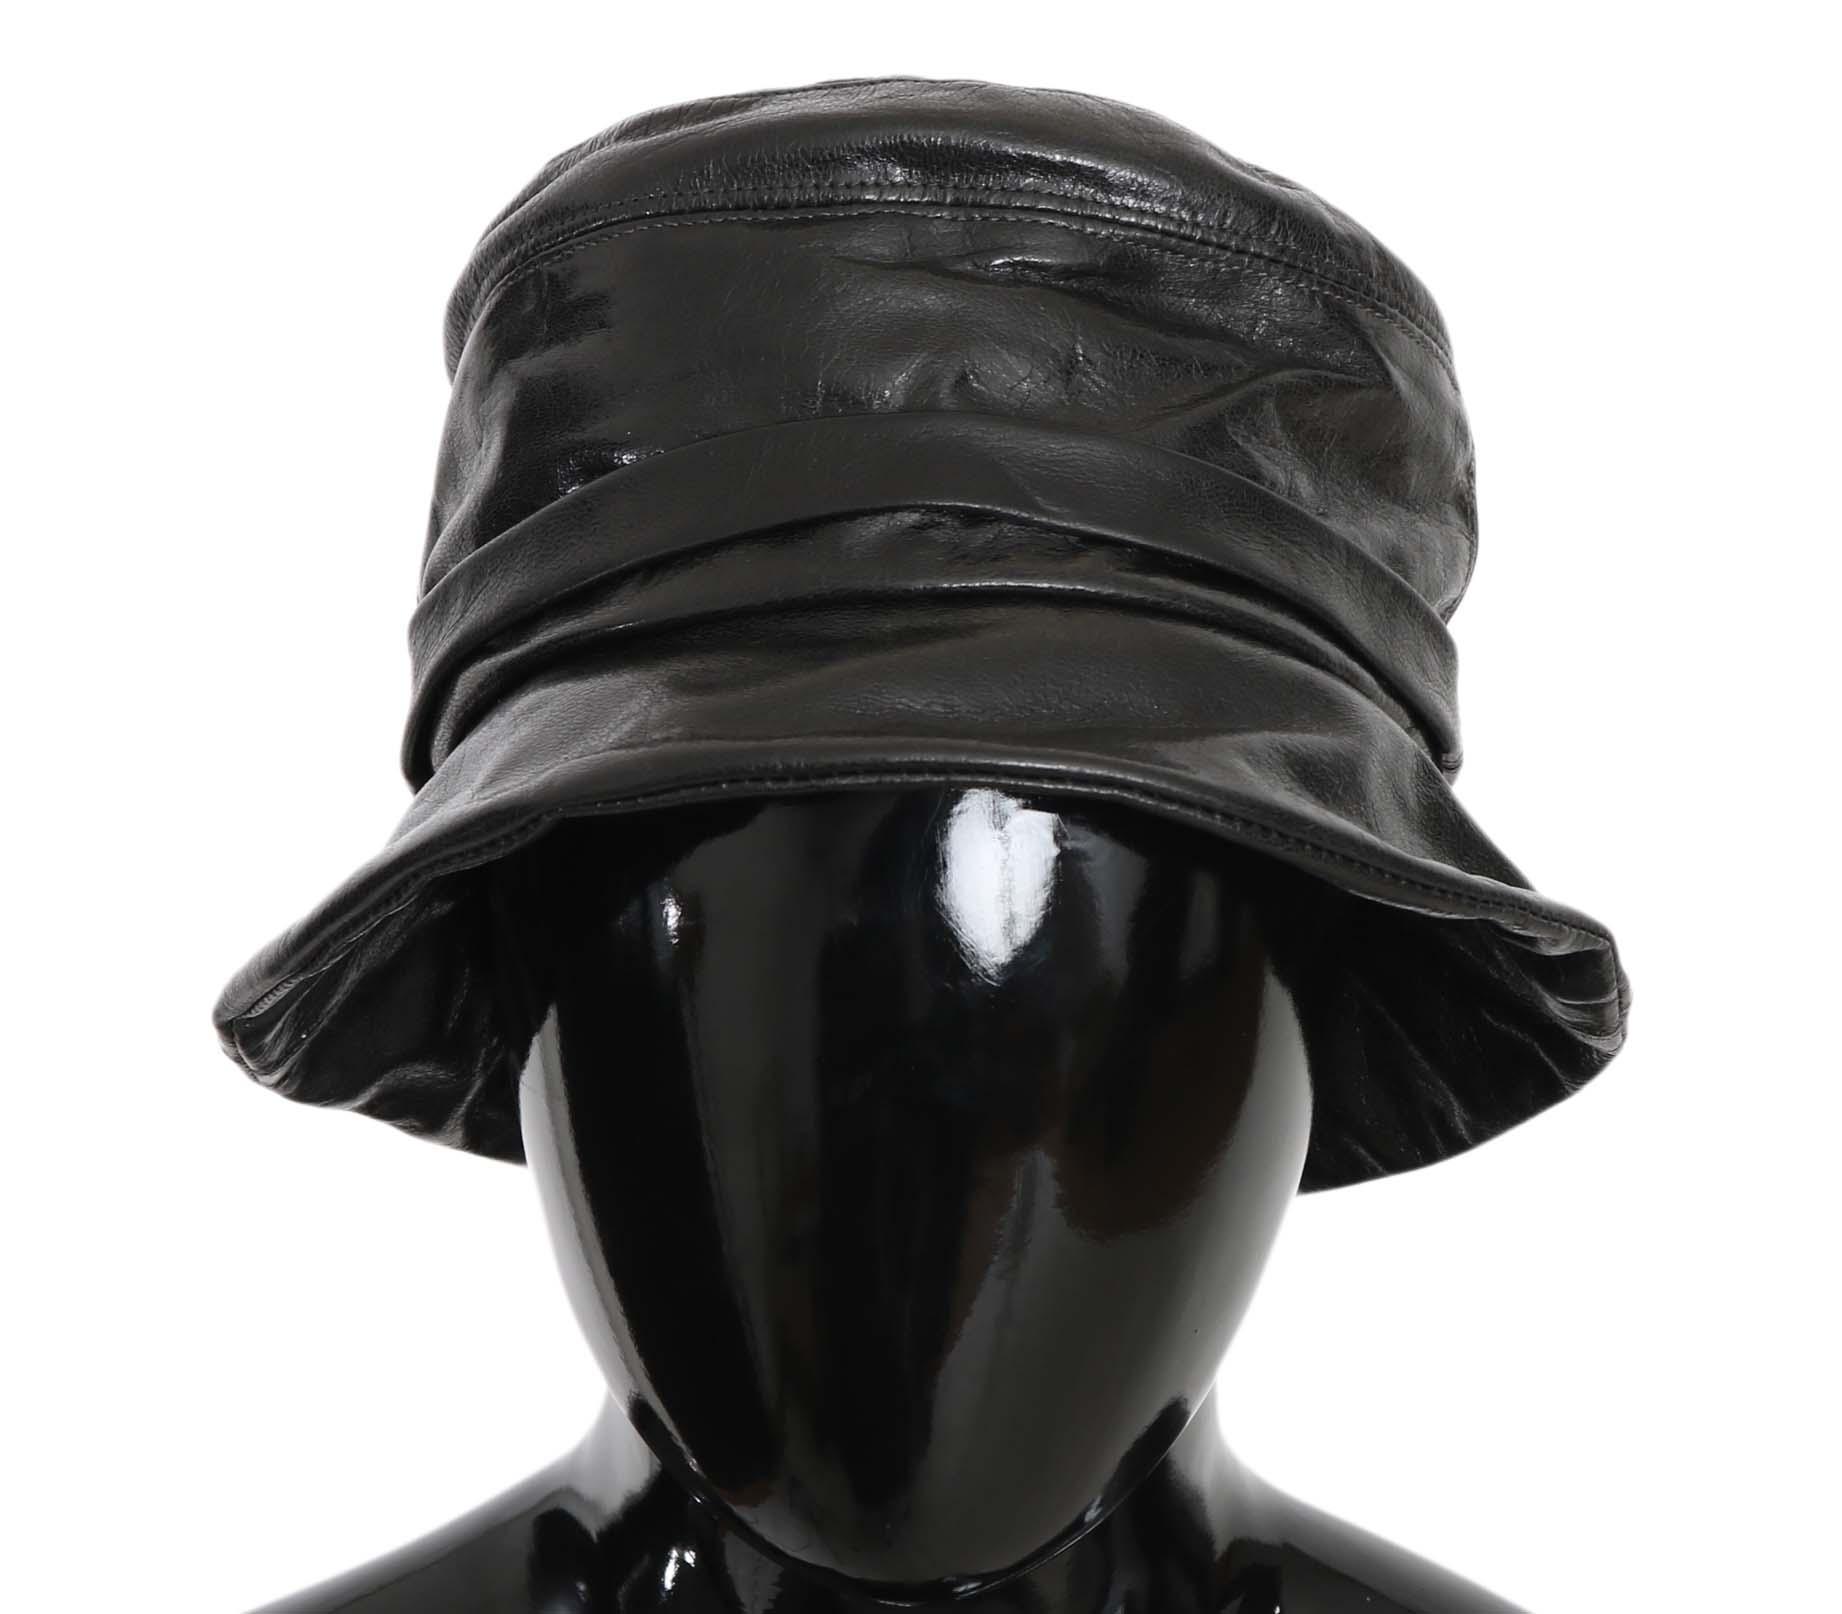 Dolce & Gabbana Women's Hat Black HAT70220 - 56 cm XS